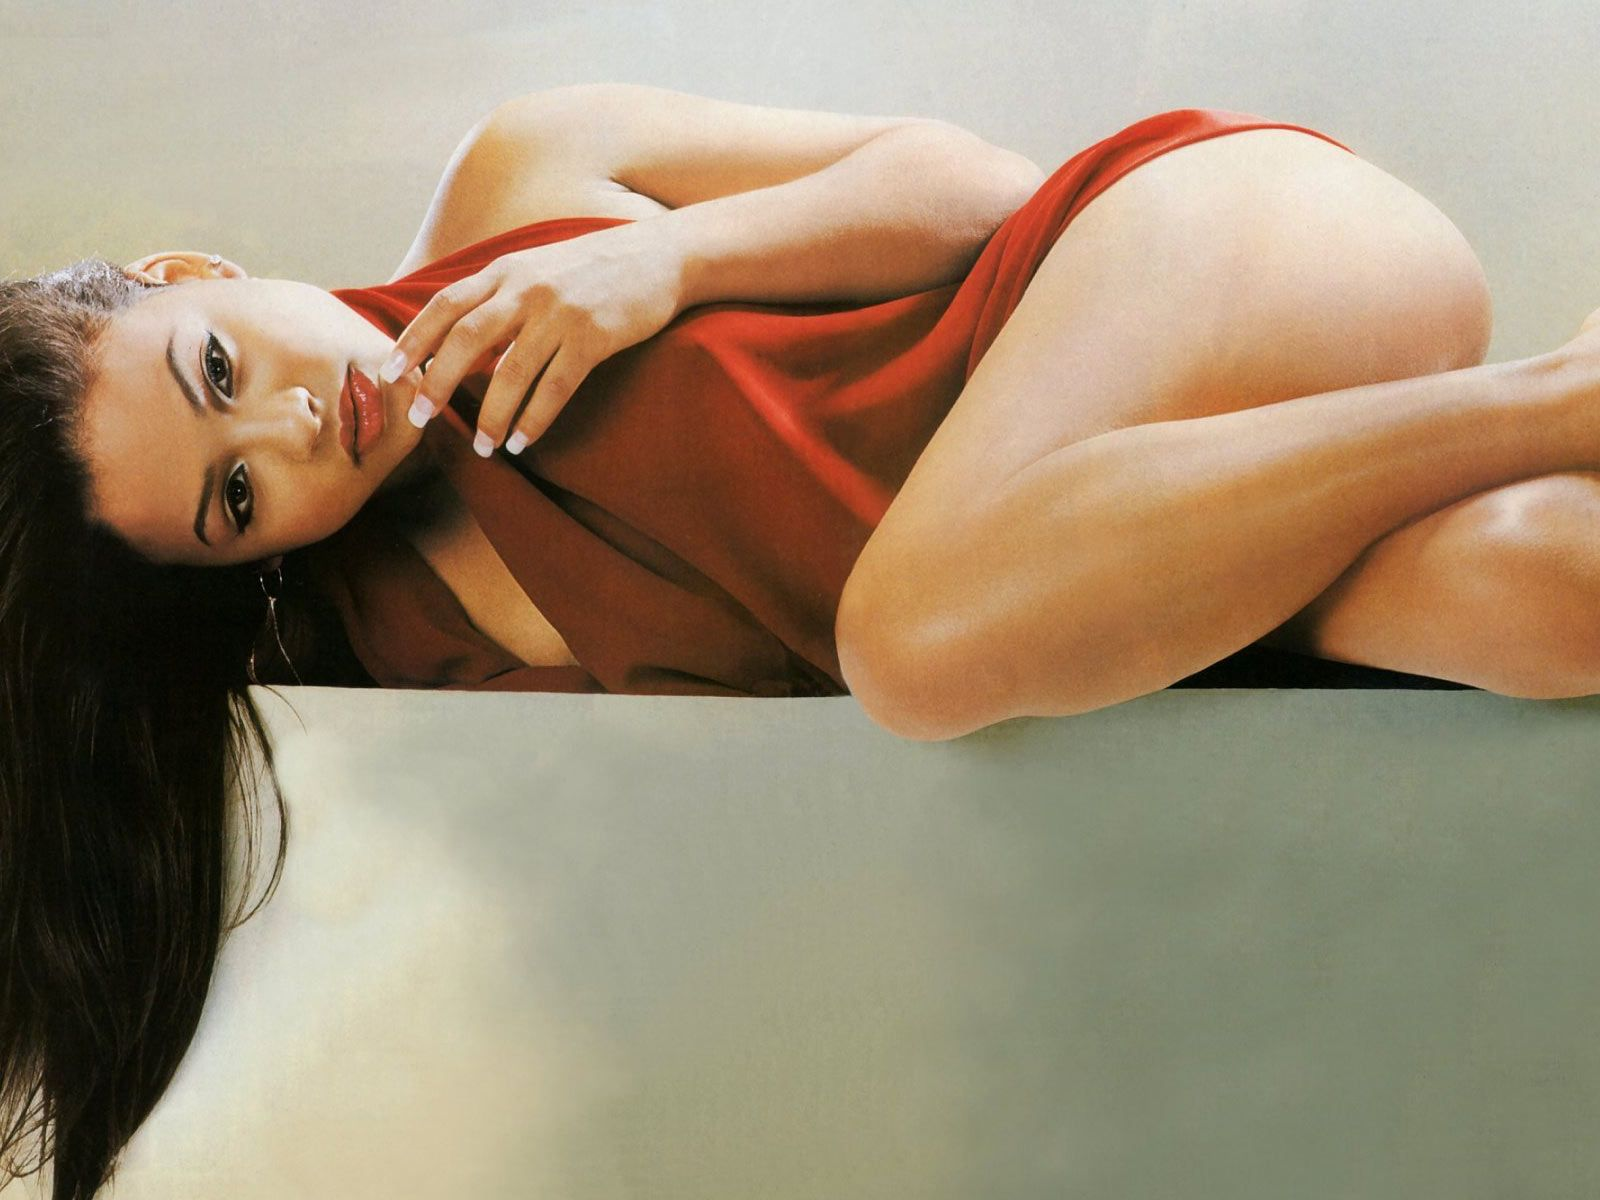 ilona wallpapers: Christina Milian hot ass wallpaper HD